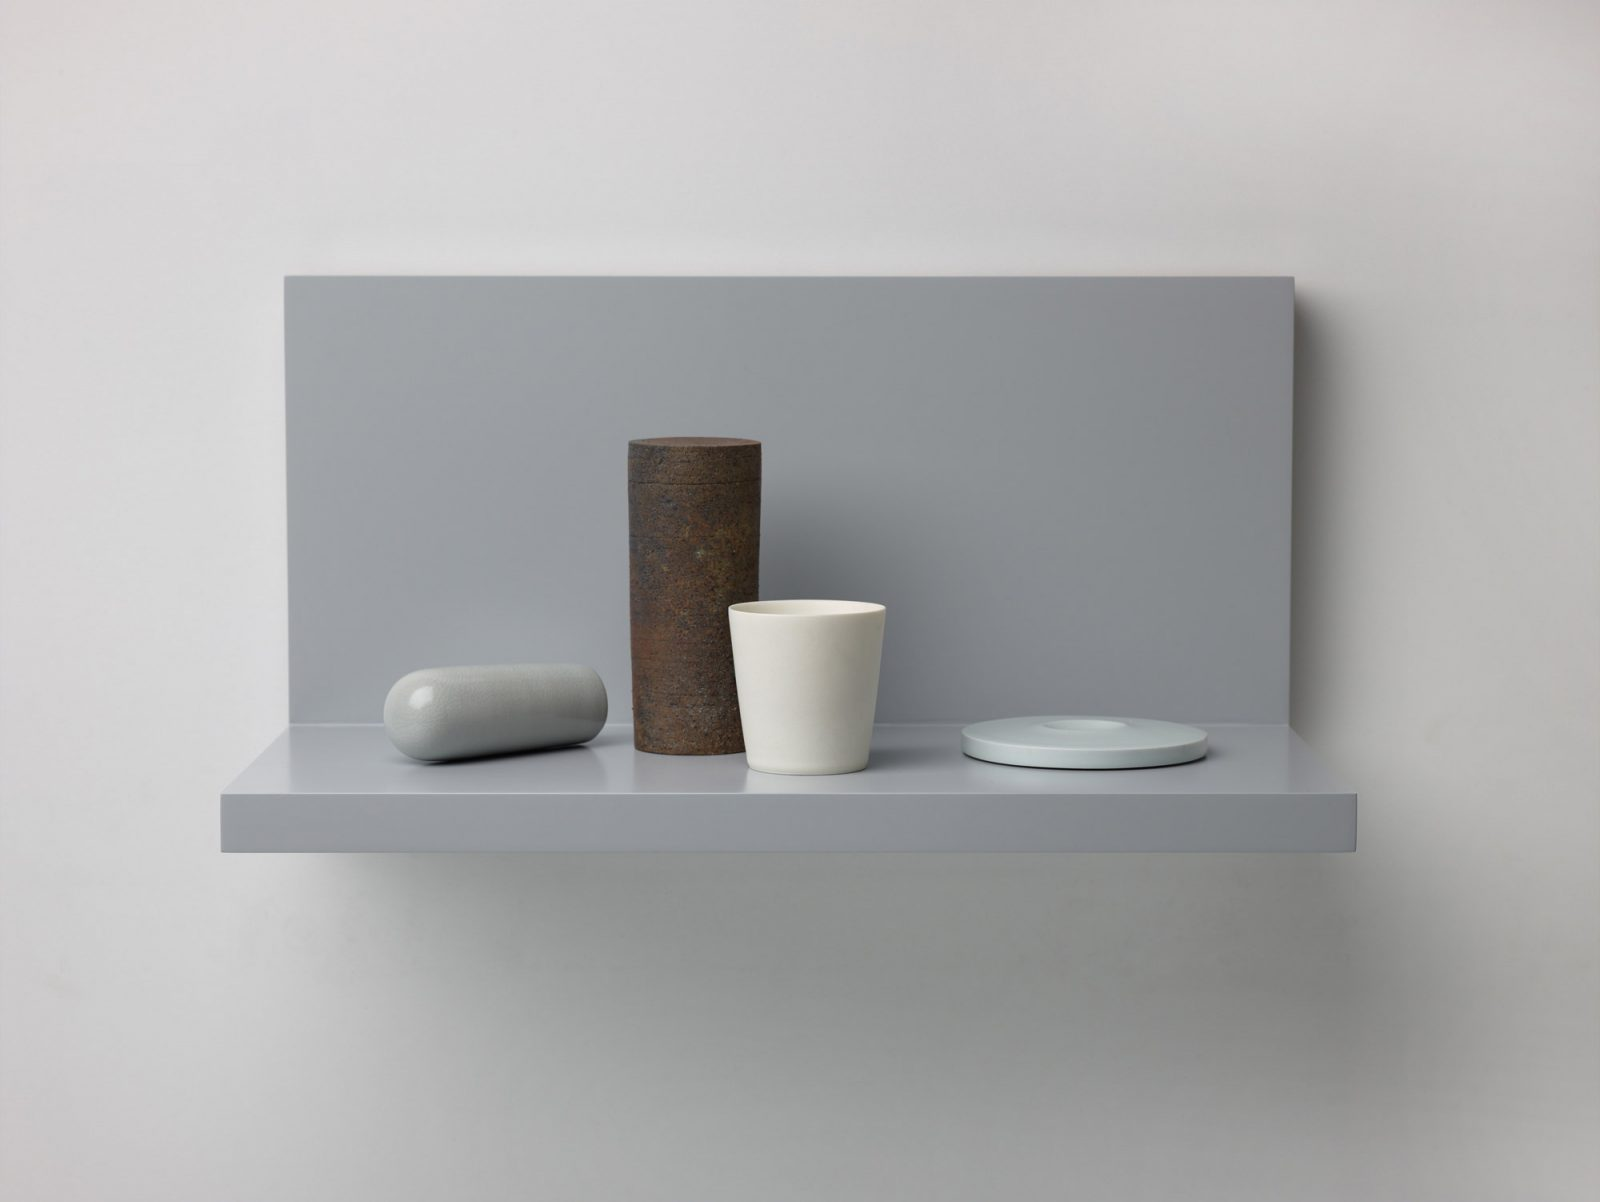 Kelly Austin, Stilled Composition 24, 2017. Ceramic, glaze, wood, acrylic paint. Photo: Peter Whyte.